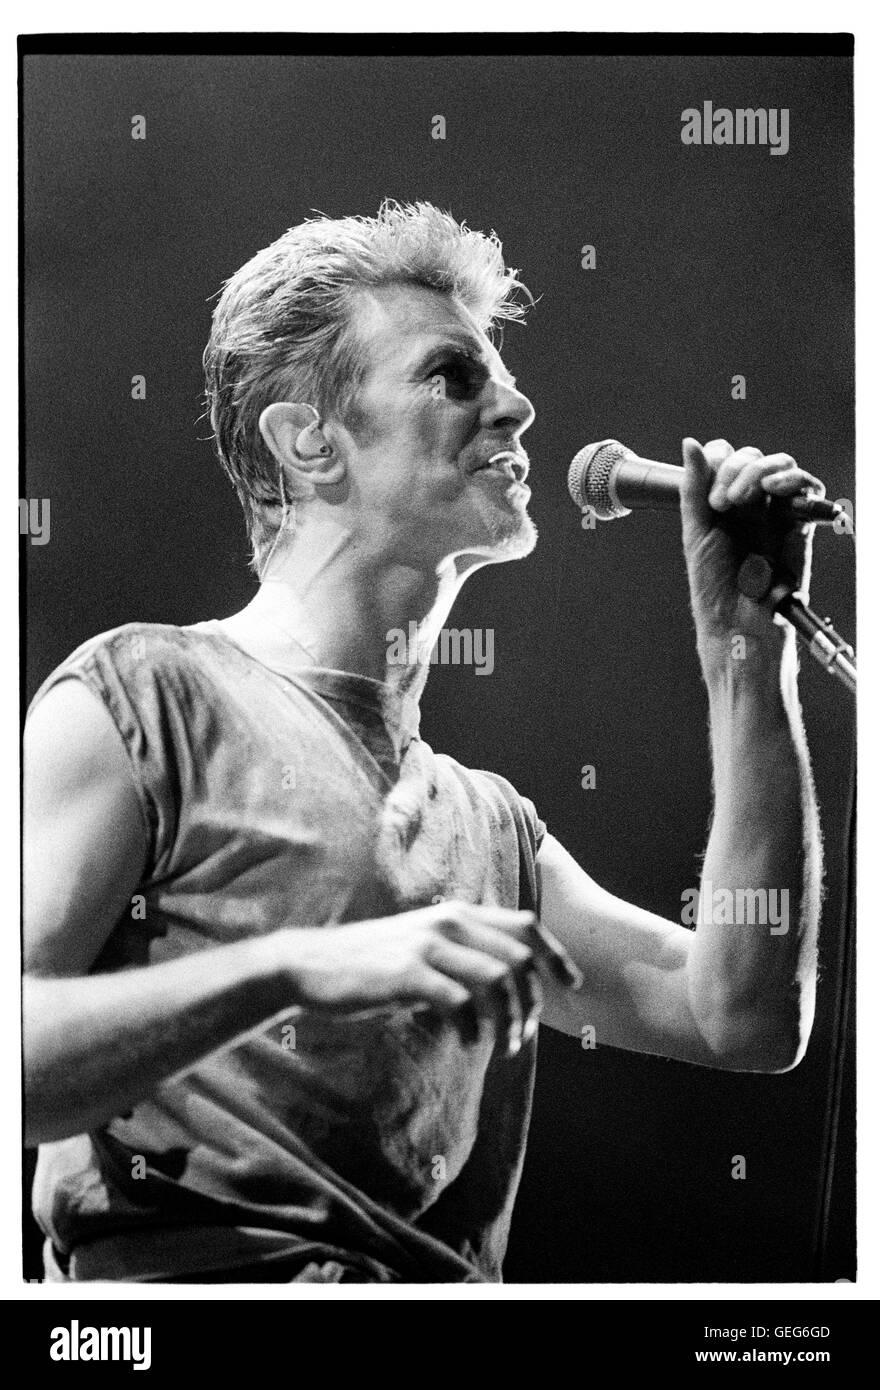 David Bowie October 21, 1995. Credit: Jay Blakesberg/MediaPunch - Stock Image